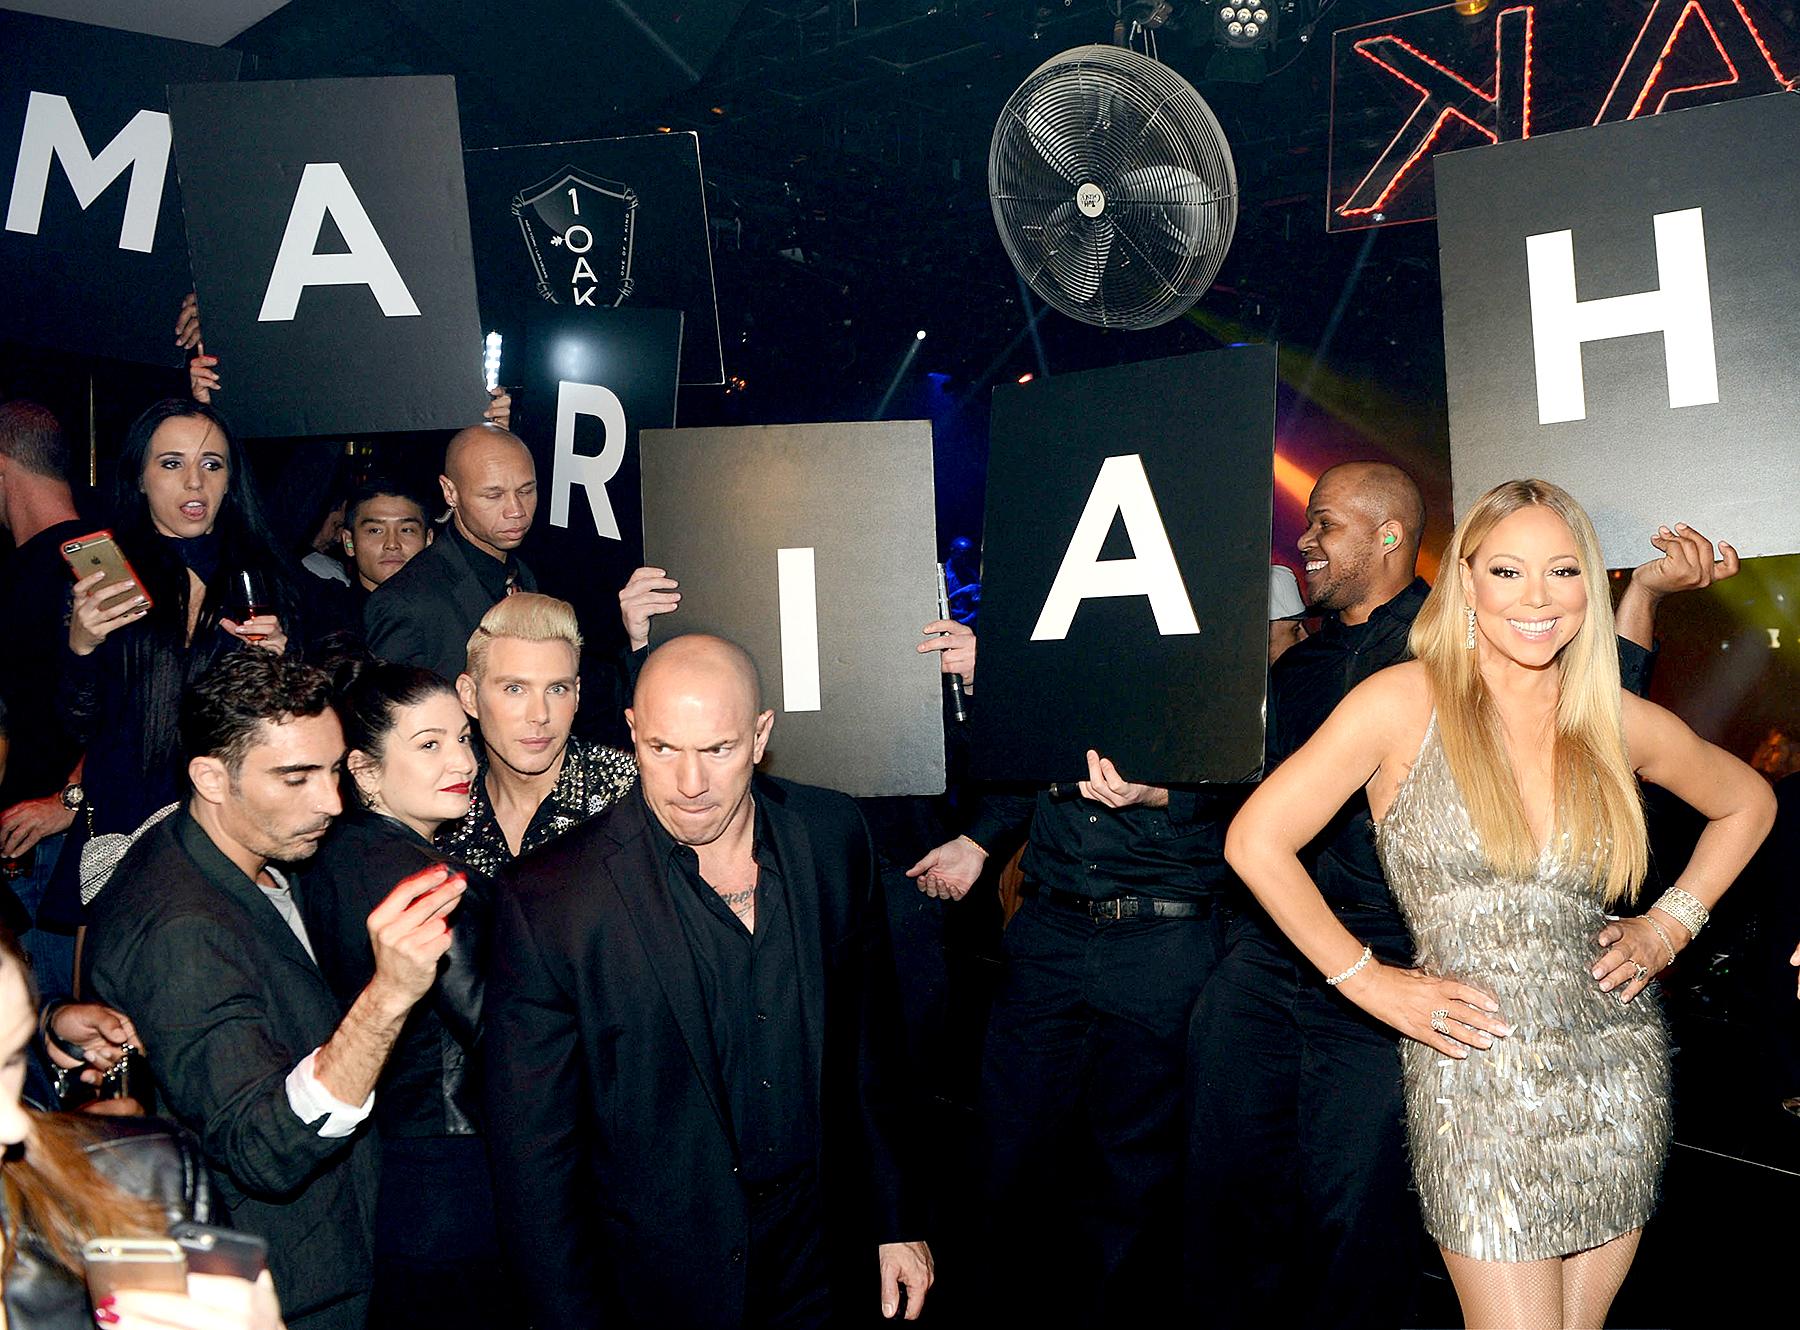 Mariah Carey celebrates her 'Mariah #1 to Infinity' wrap party at 1 OAK Nightclub at The Mirage Hotel & Casino on February 20, 2016 in Las Vegas, Nevada.